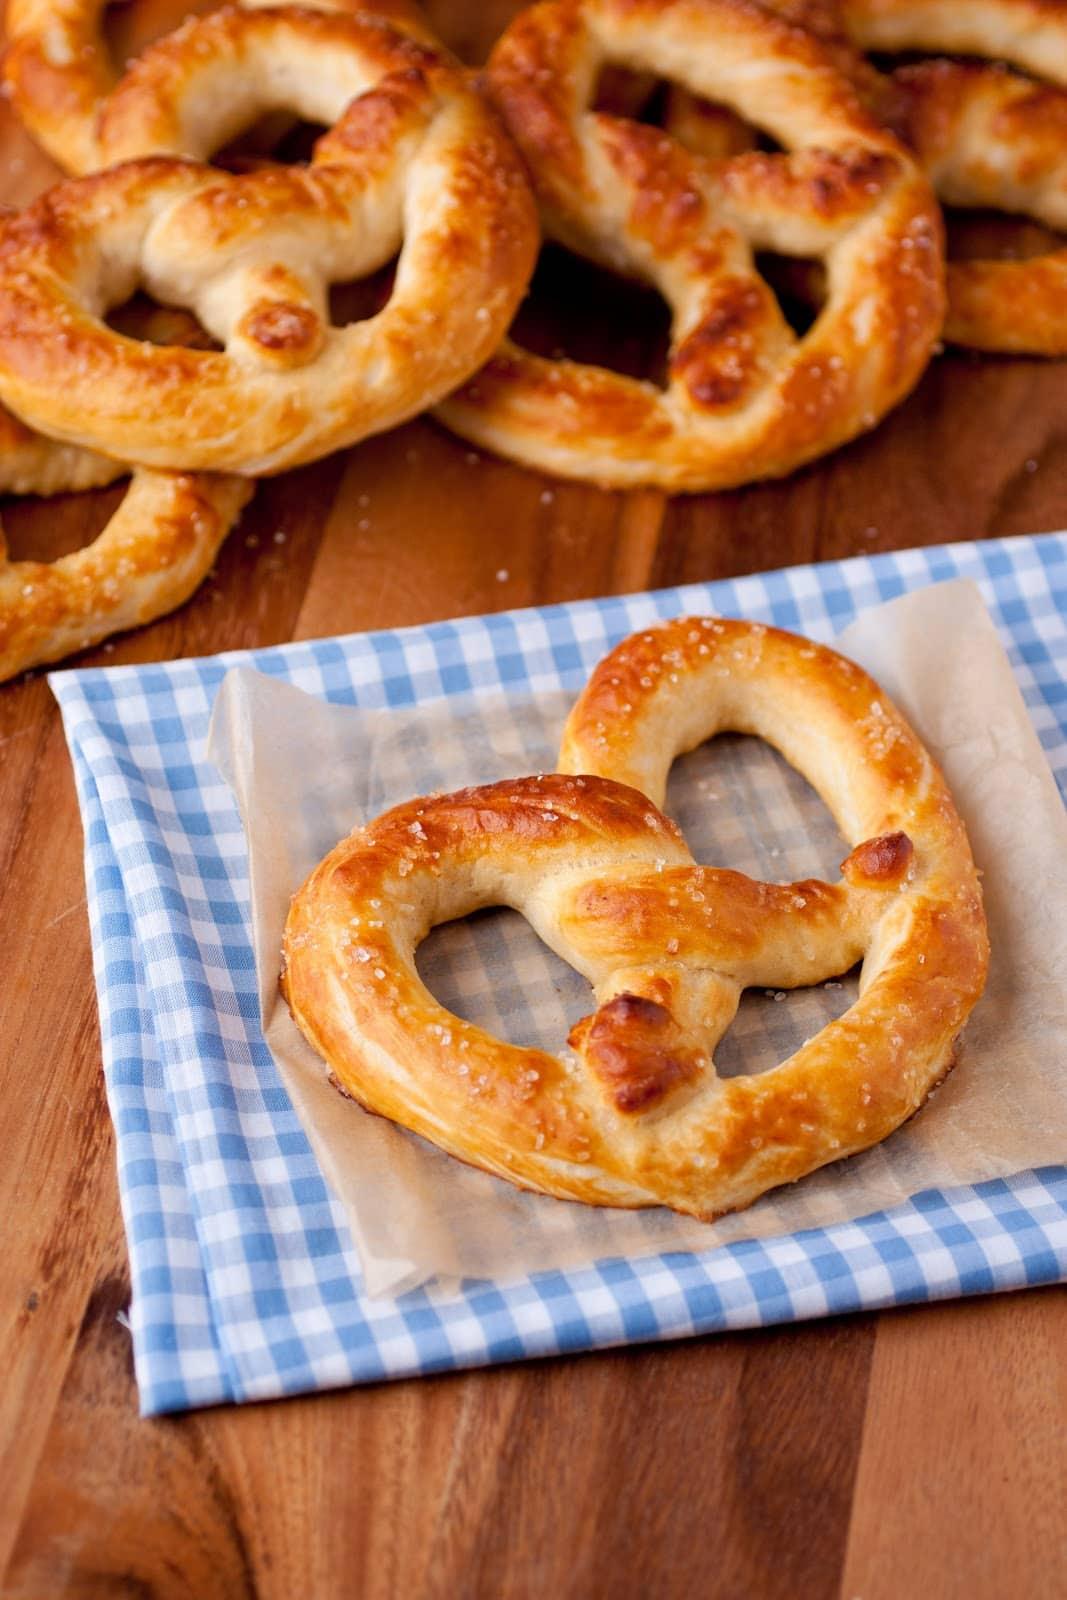 Annie S Culinary Creations Part 2: Auntie Anne's Pretzel's Copycat Recipe